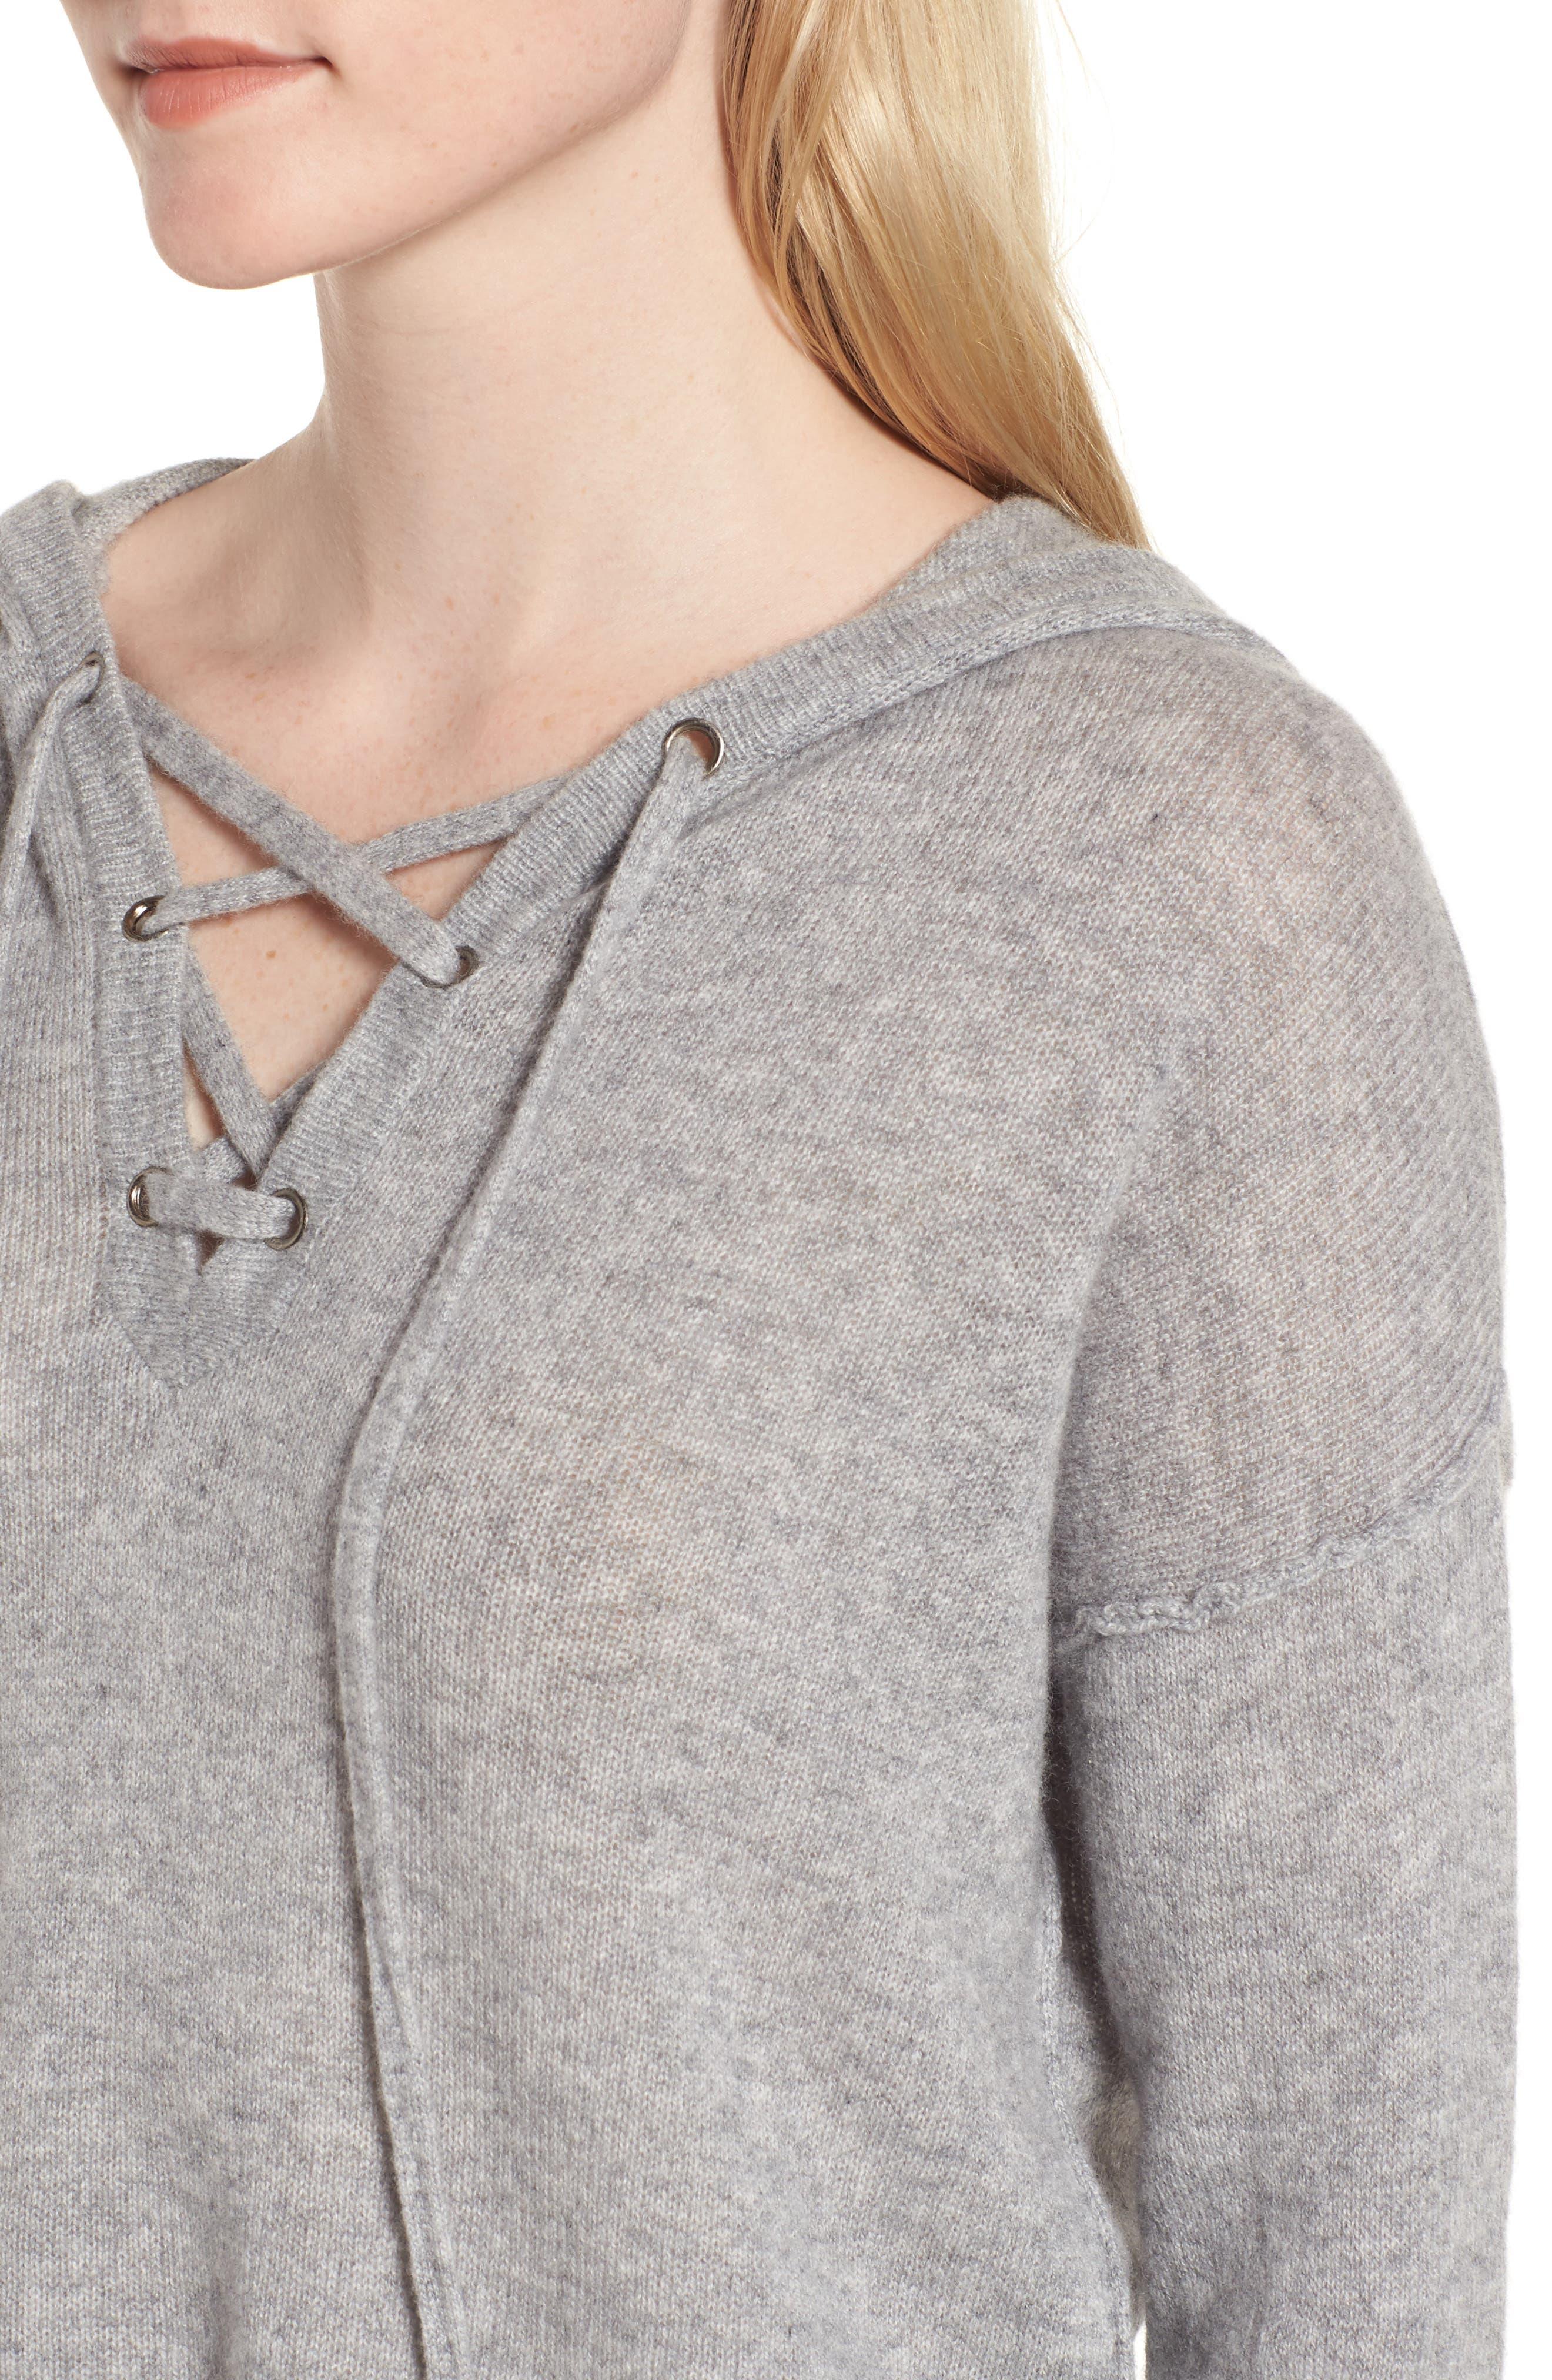 Dakota Cashmere Hooded Sweater,                             Alternate thumbnail 4, color,                             Heather Grey